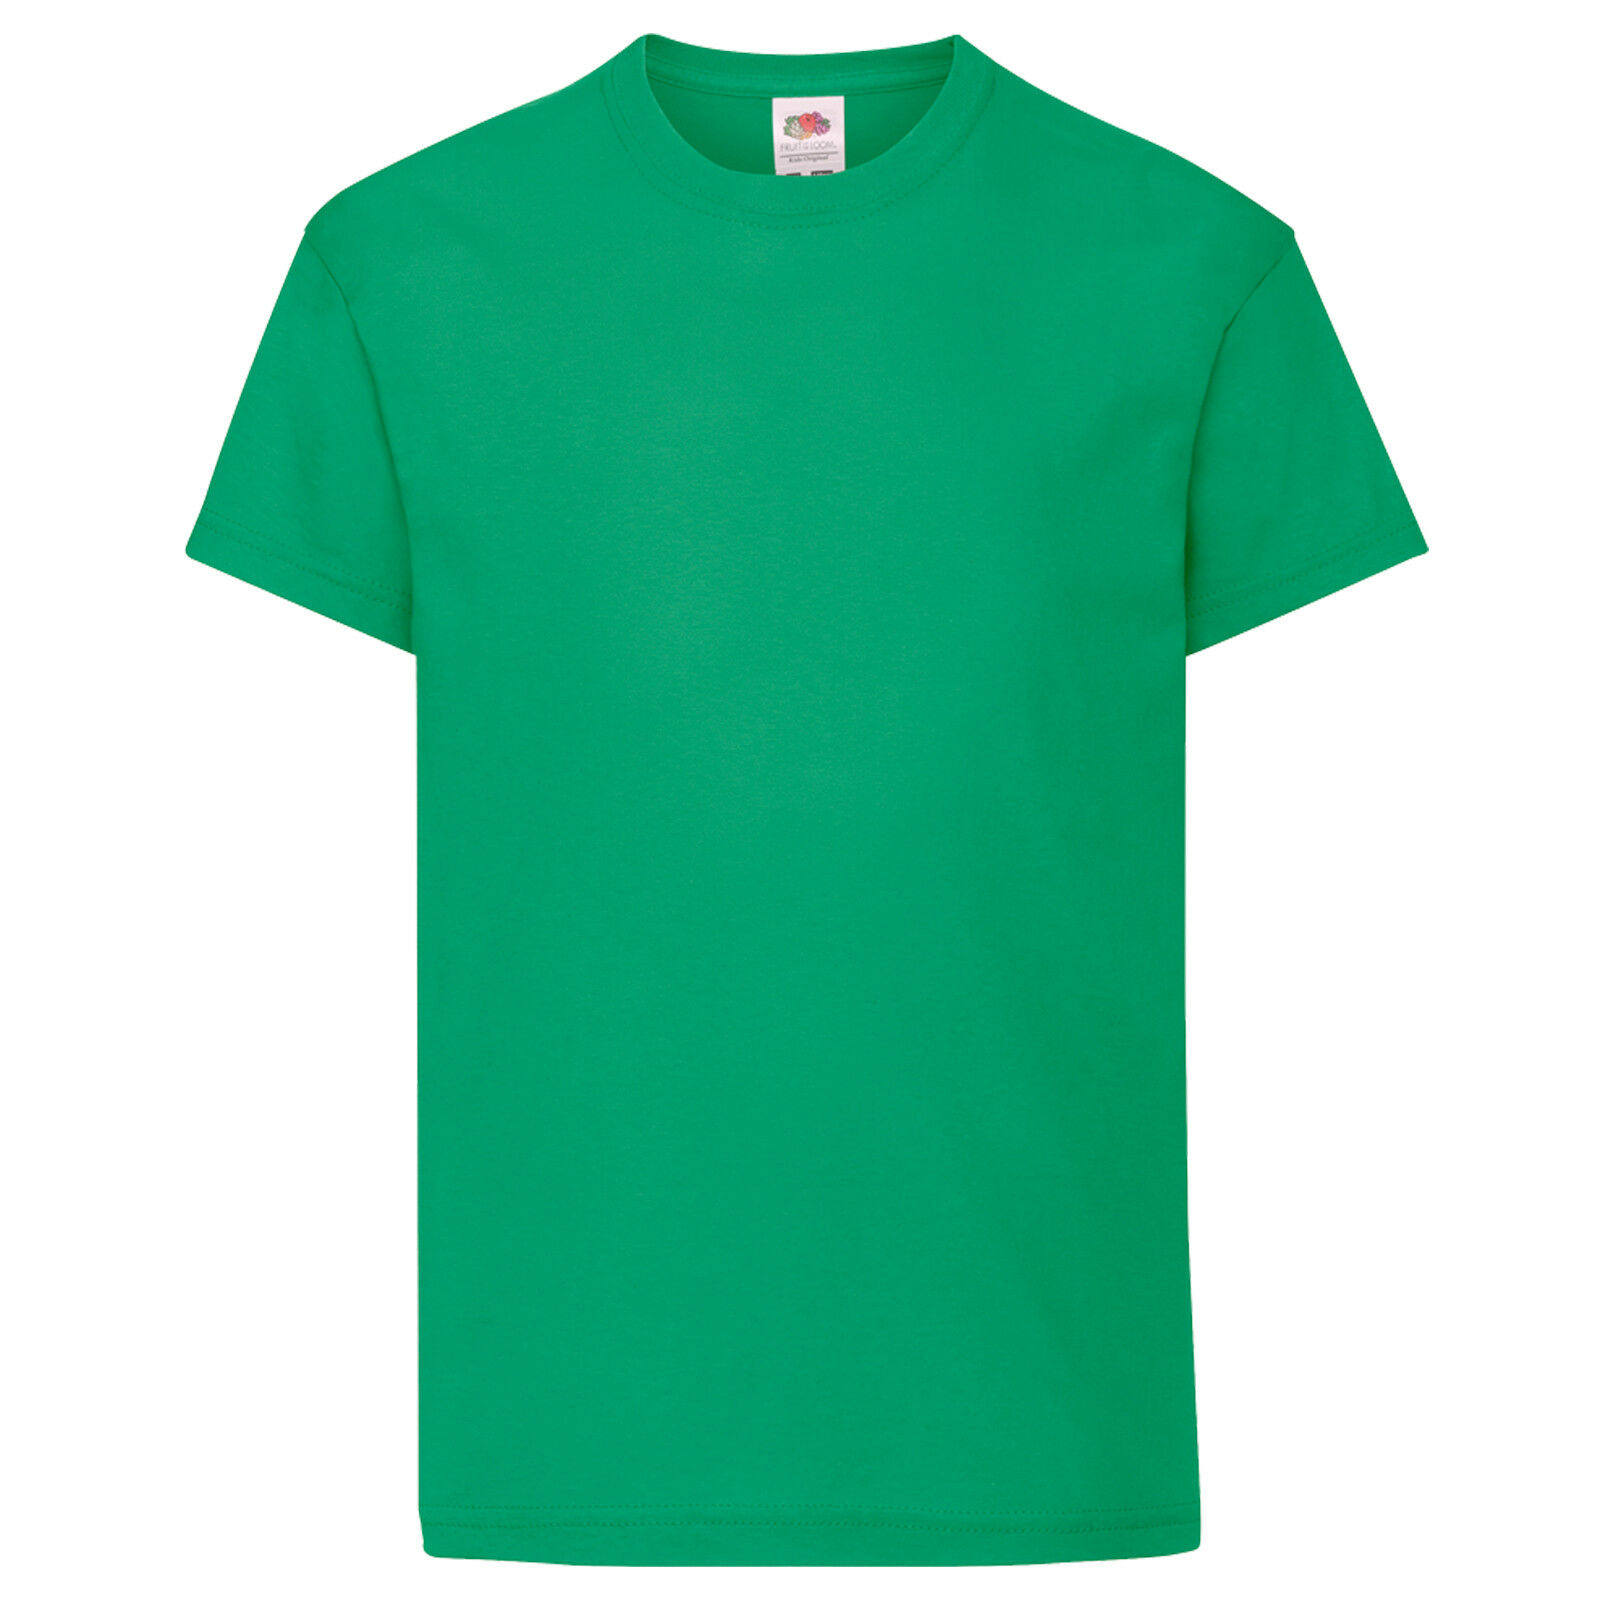 Fruit-Of-The-Loom-Camiseta-de-manga-corta-Original-de-Fruit-Of-The-Loom-para-n